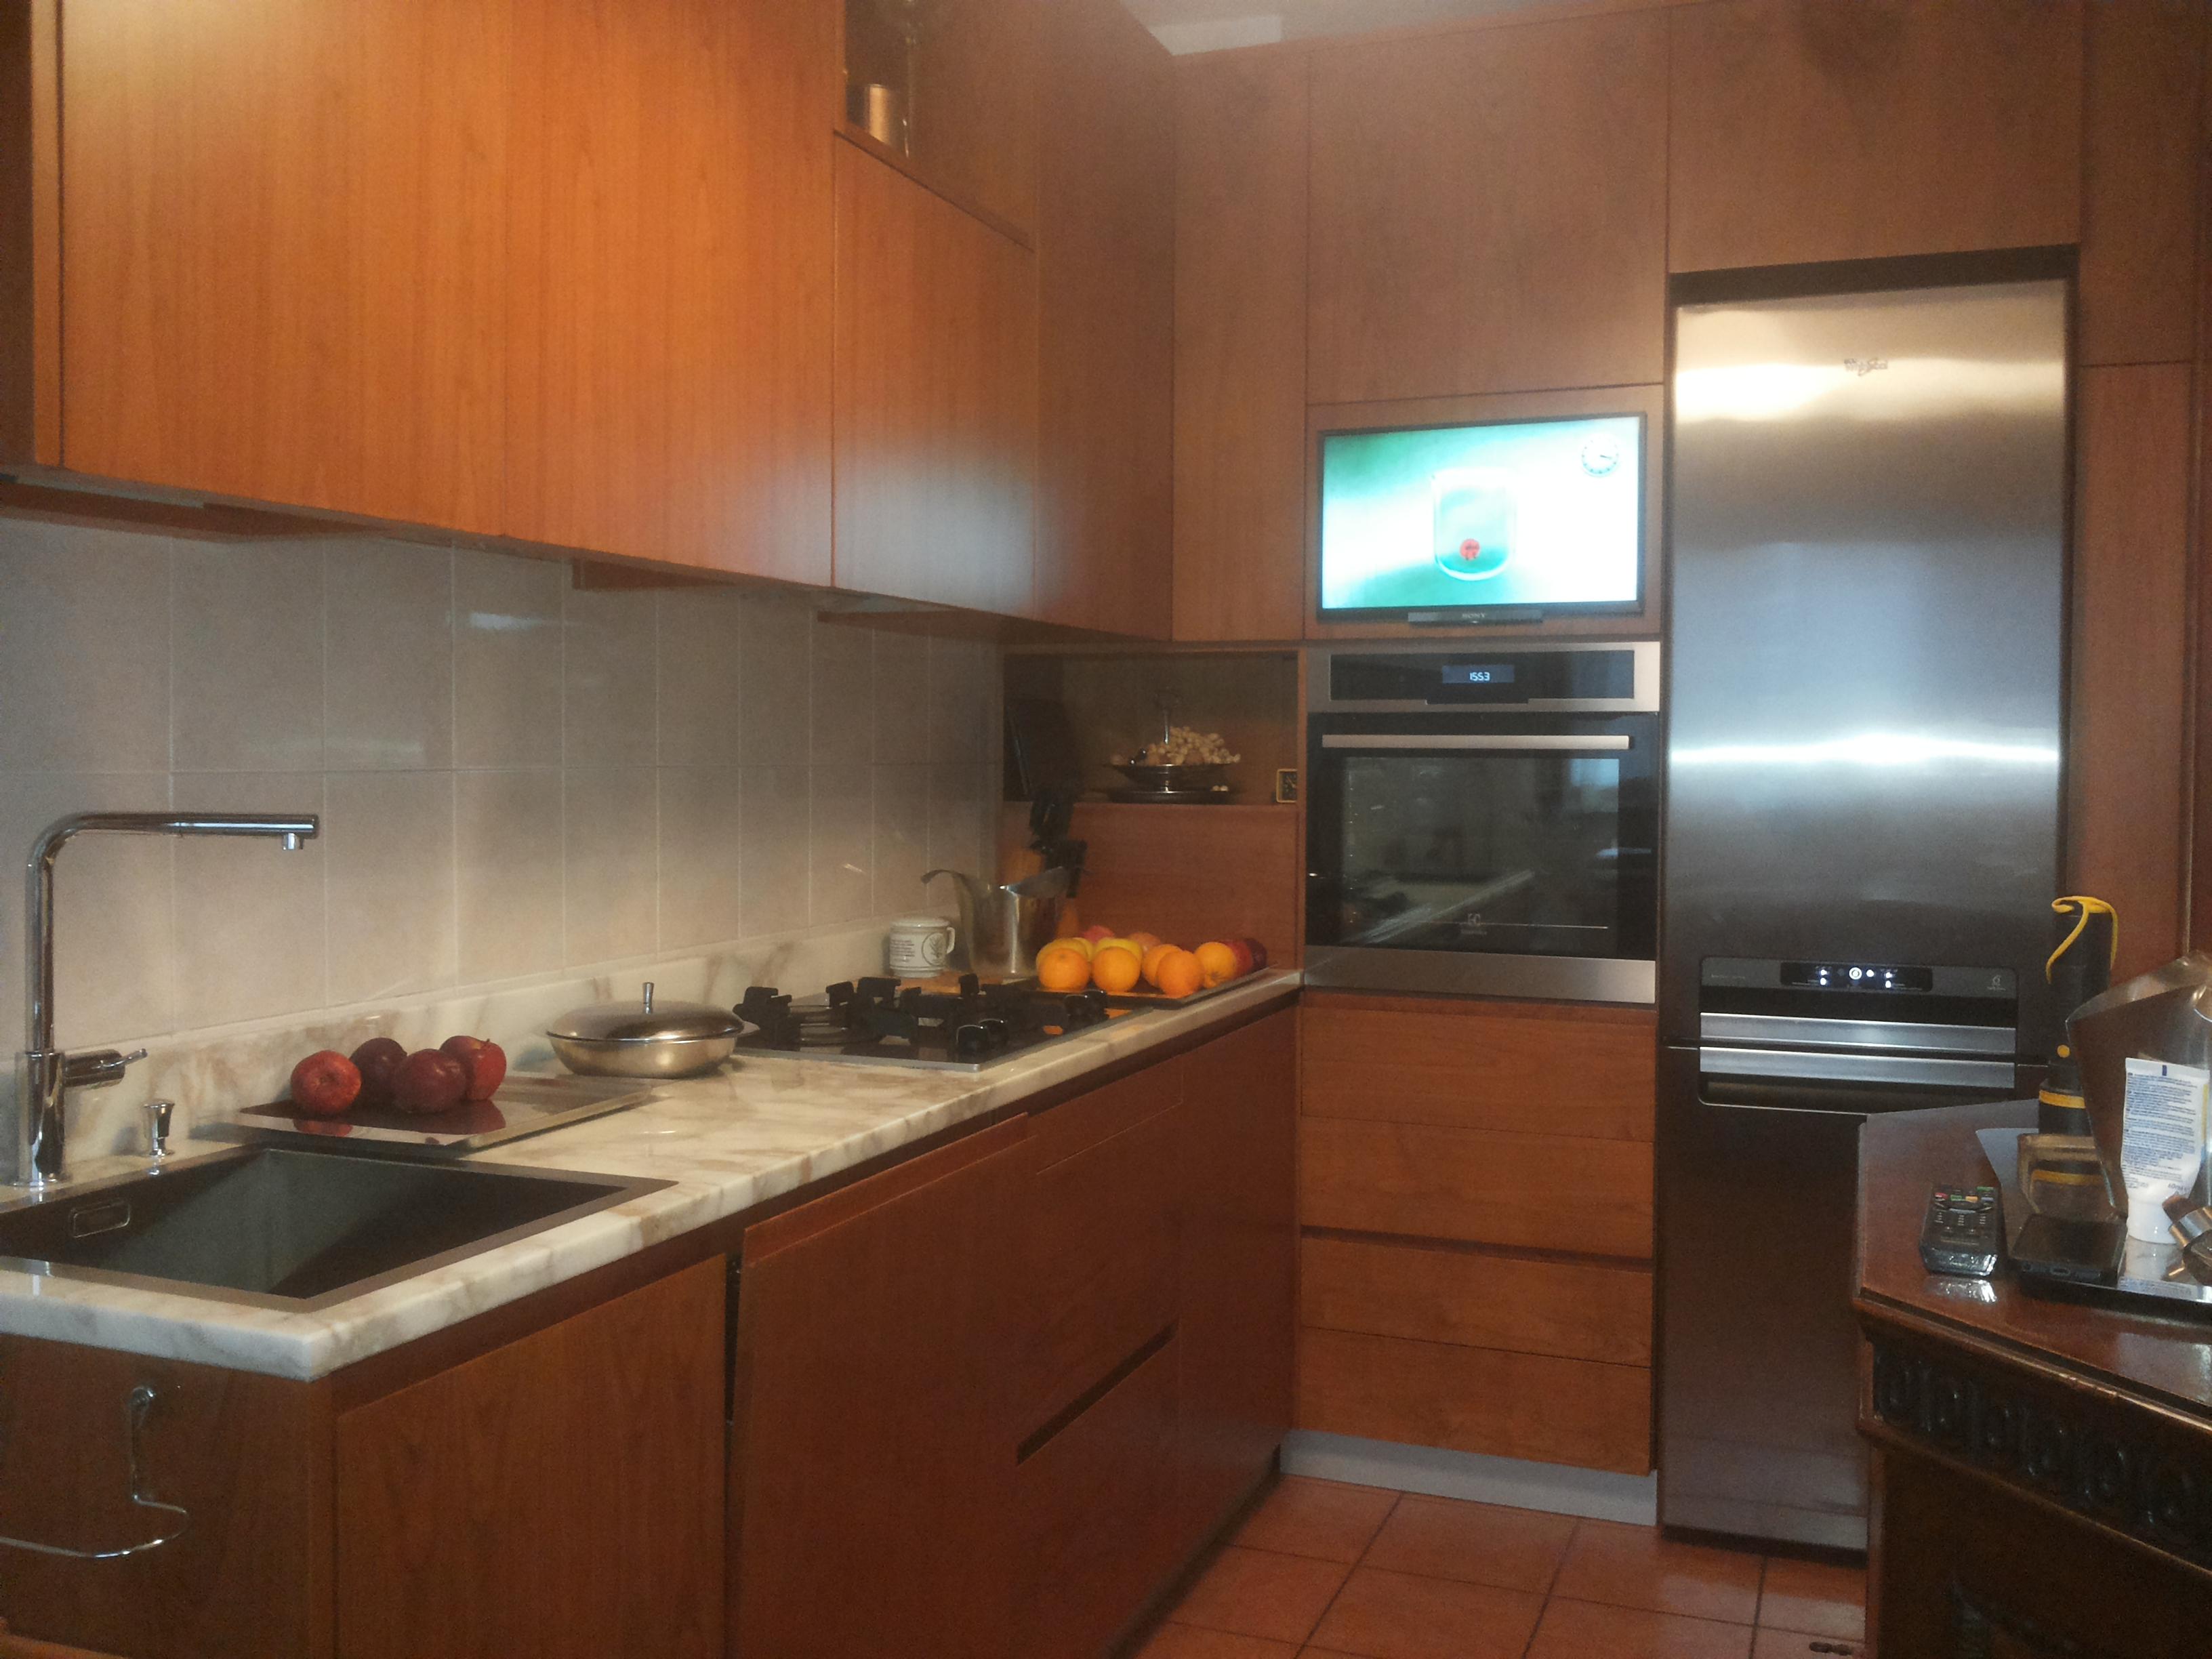 Cucina in legno ciliegio falegnameria curioni - Cucina in ciliegio ...